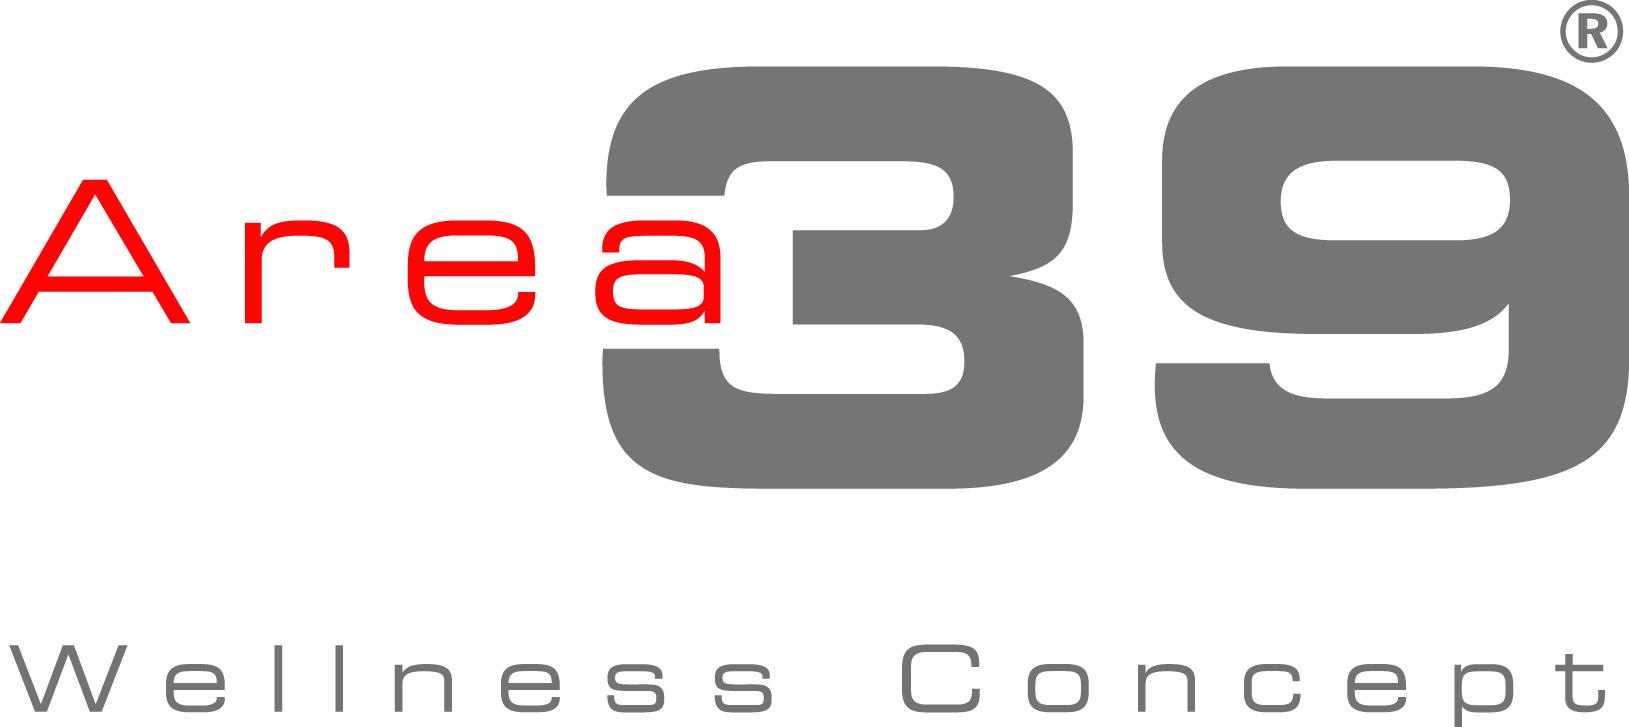 Area 39 Wellness Concept